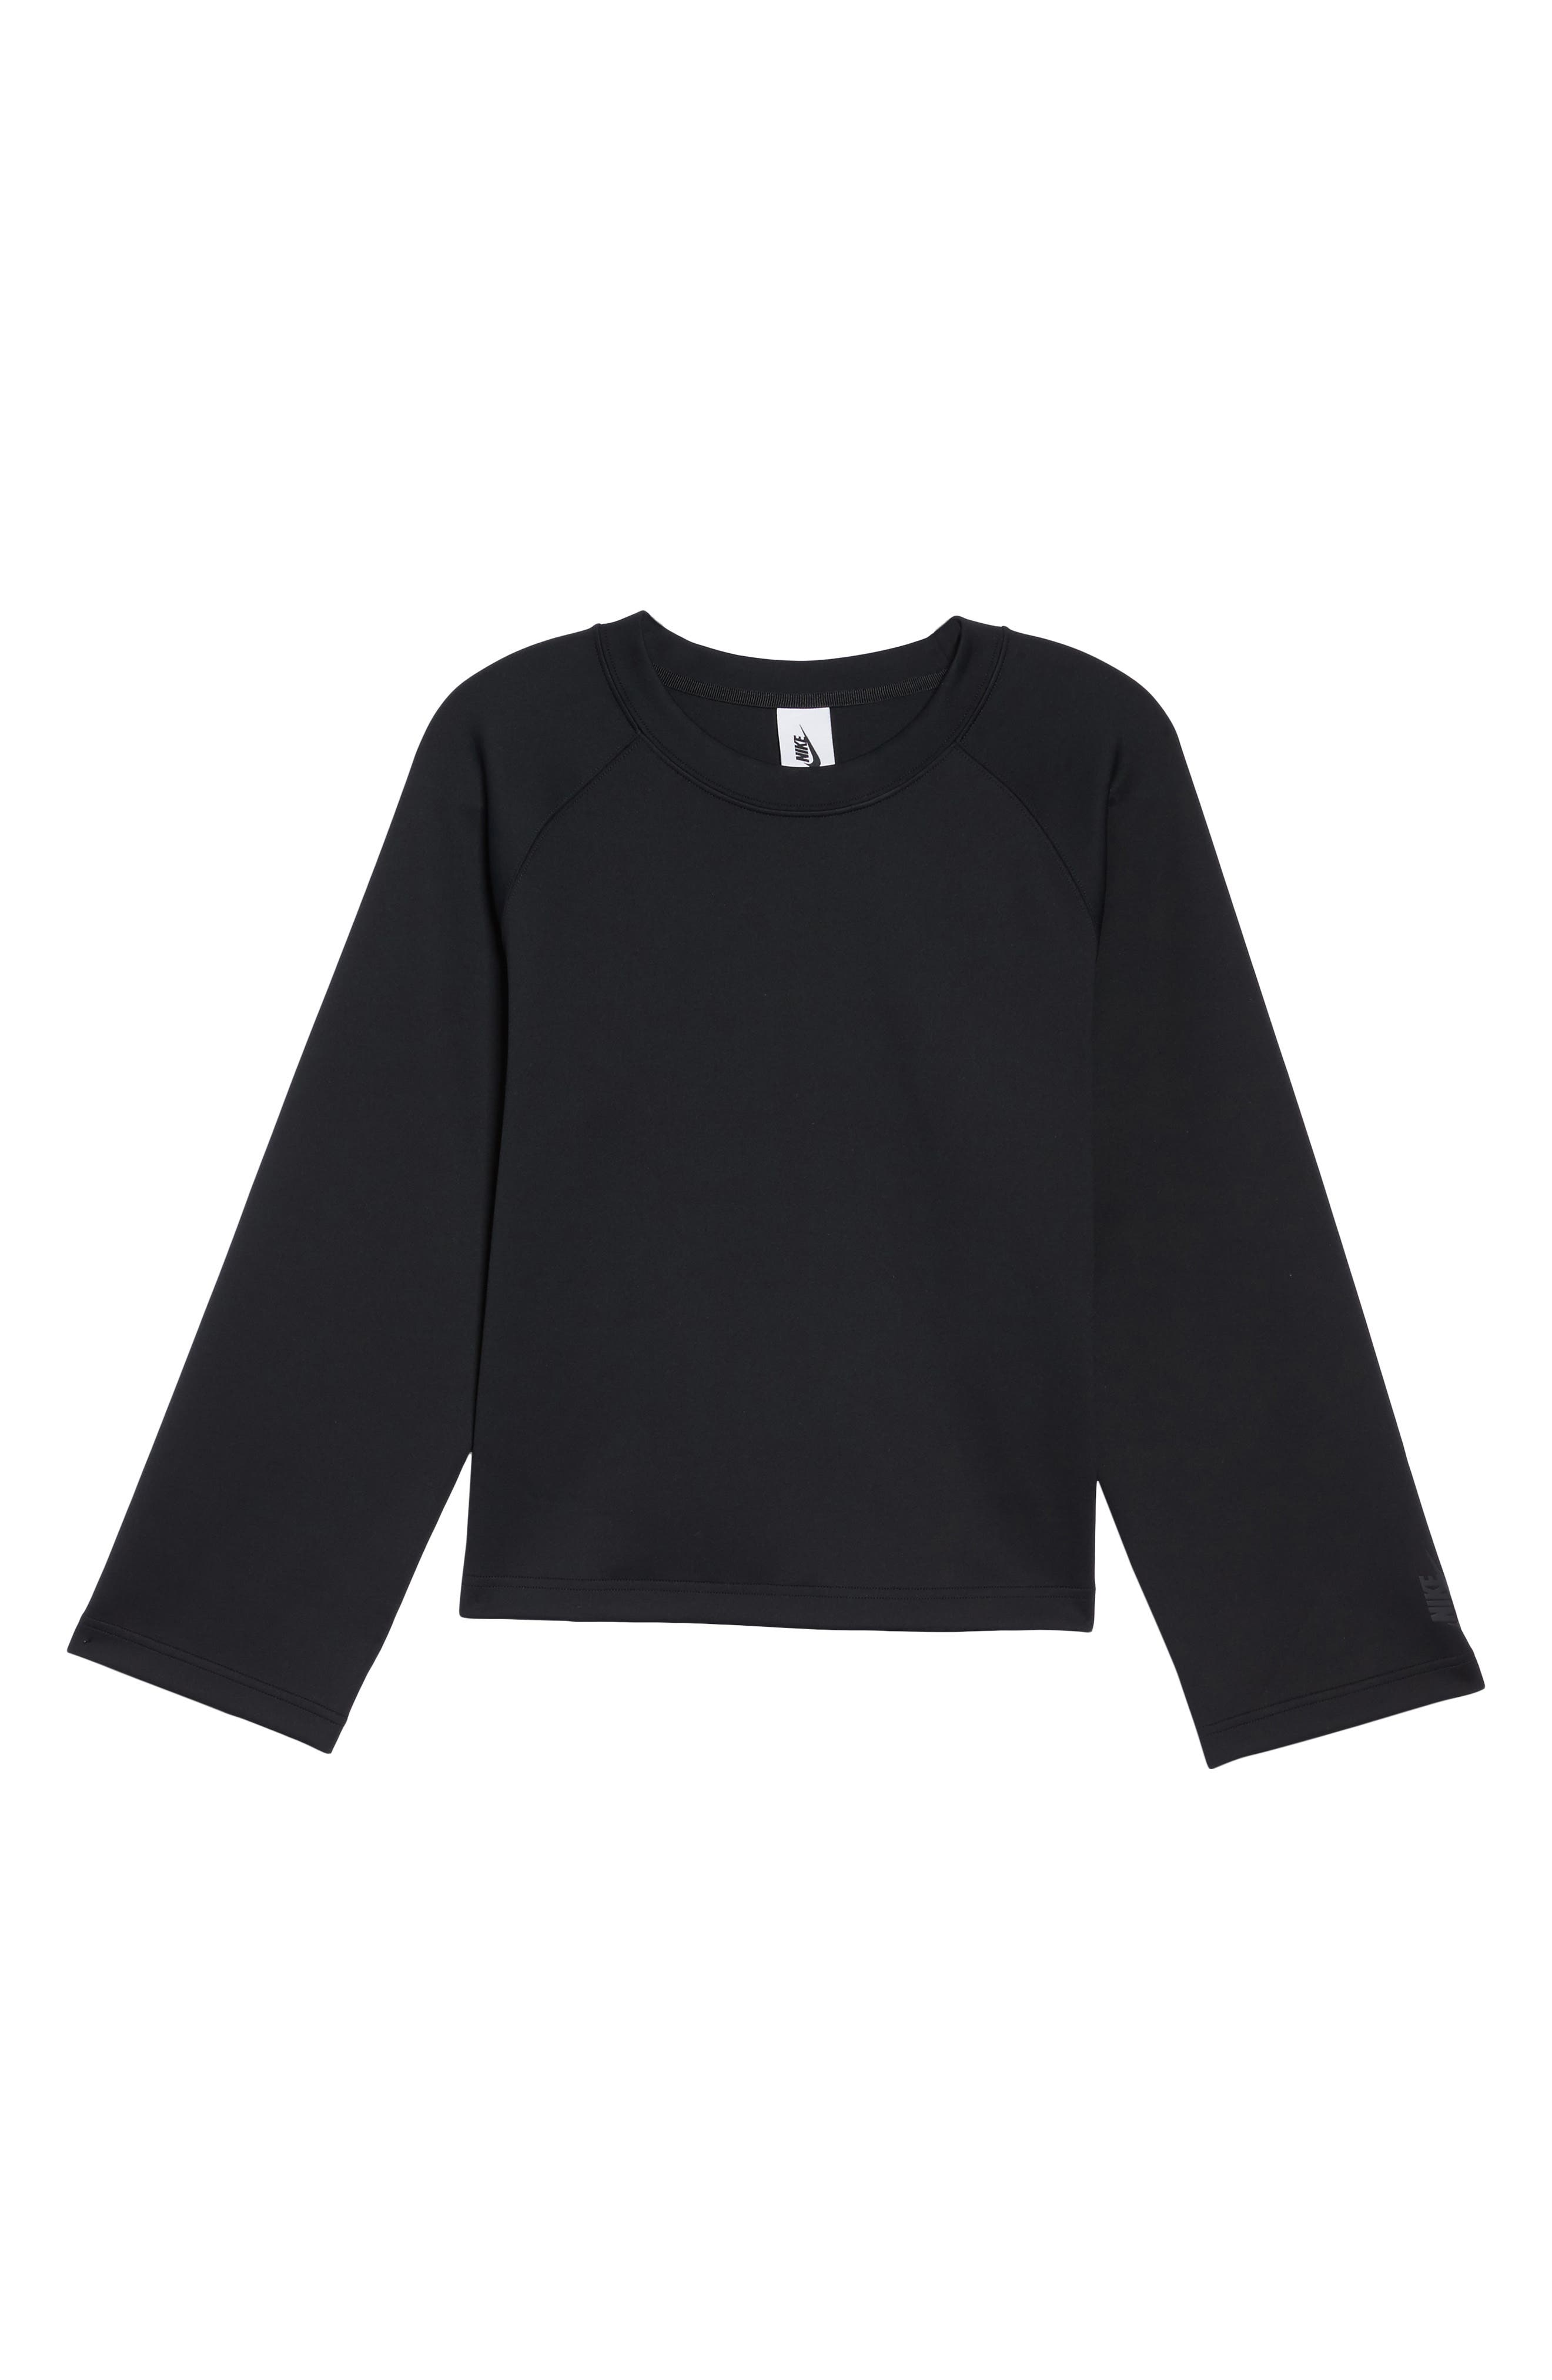 NikeLab Essentials Women's Fleece Top,                             Alternate thumbnail 12, color,